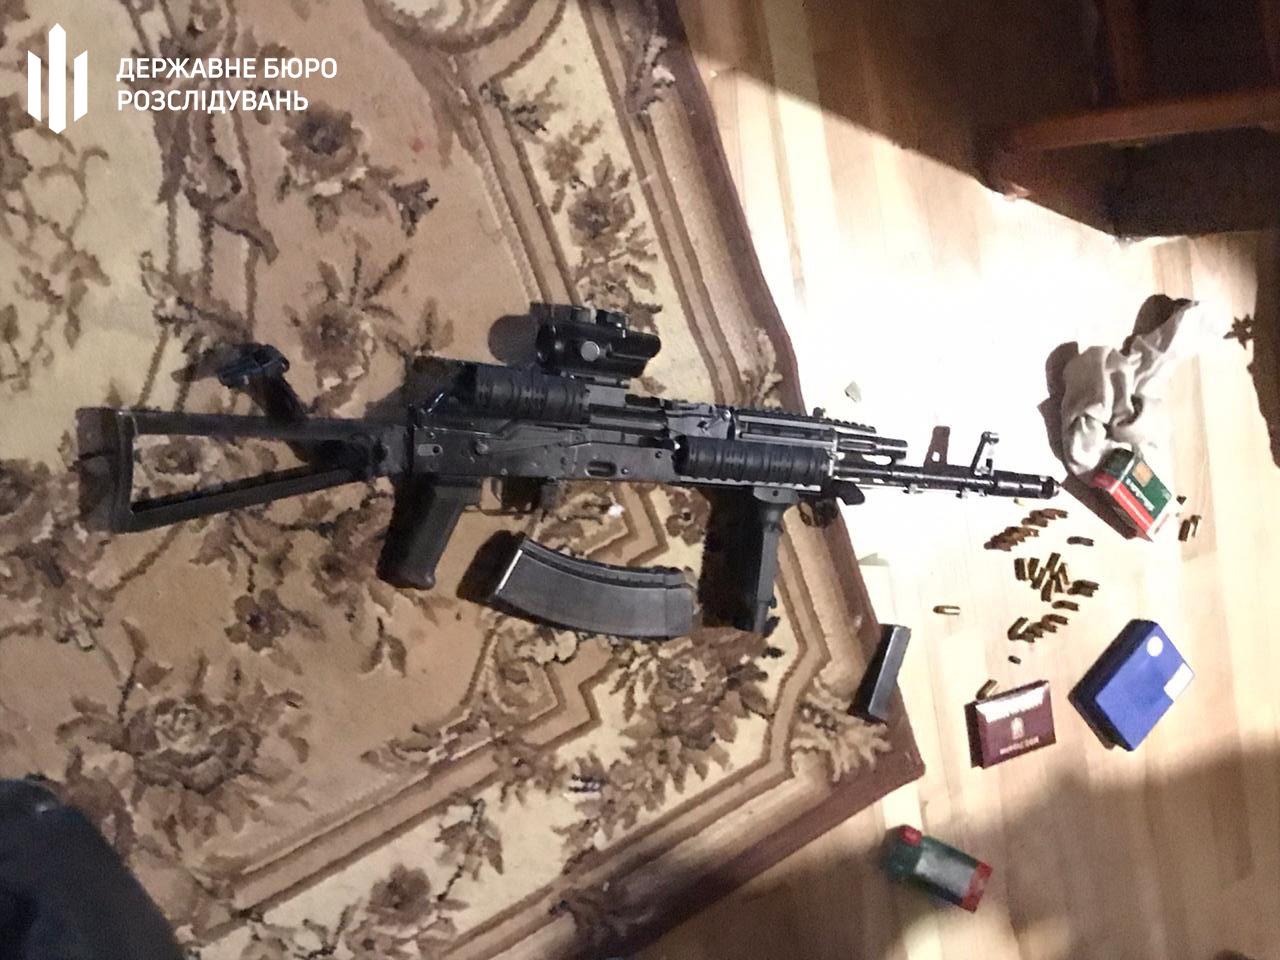 Бориспільщина: у Чорновол при обшуку знайшли вогнепальну та холодну зброю -  - 57206